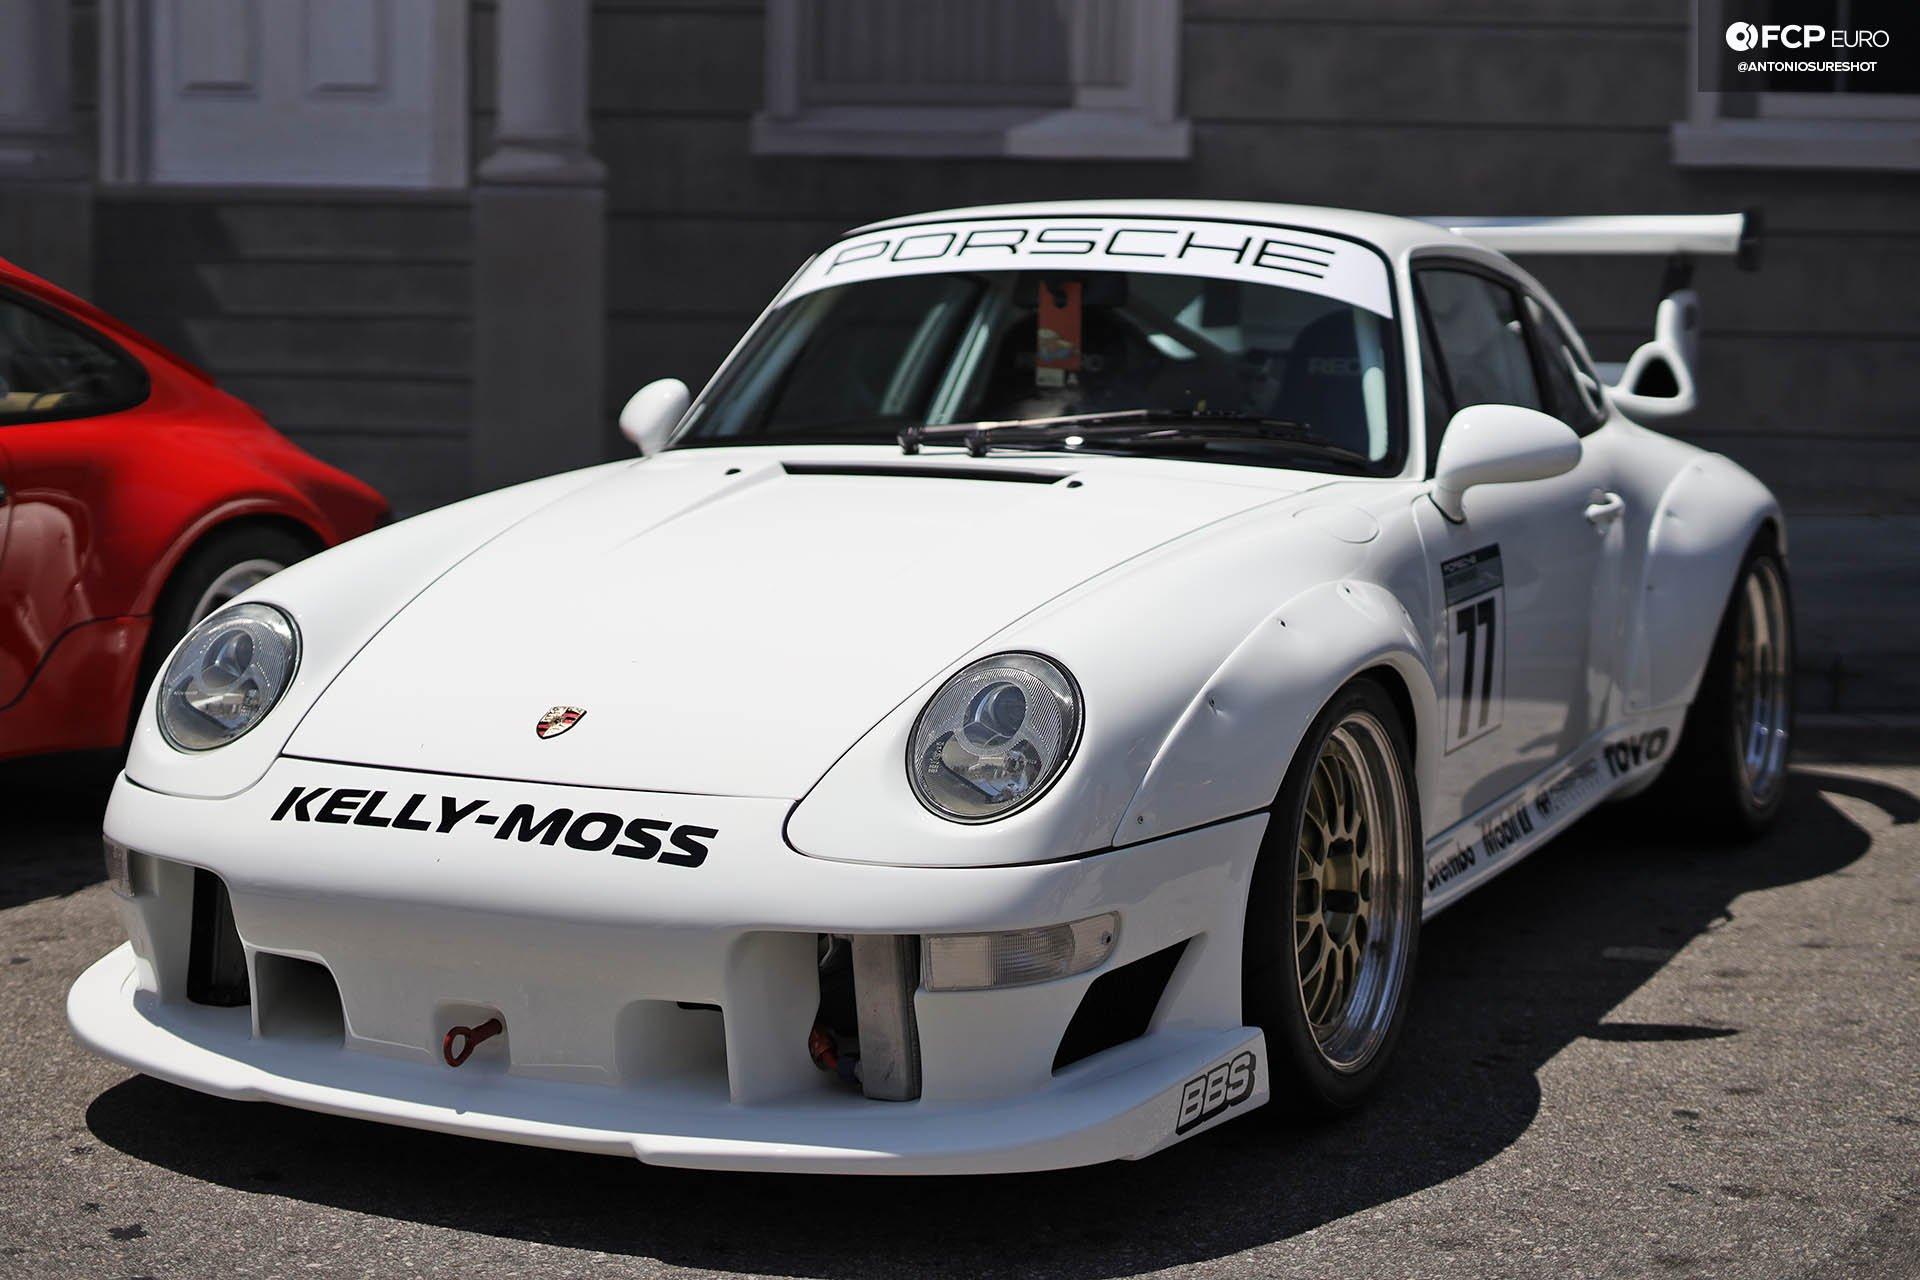 Luftgekühlt 993 911 Turbo GT2 Evo Kelly Moss